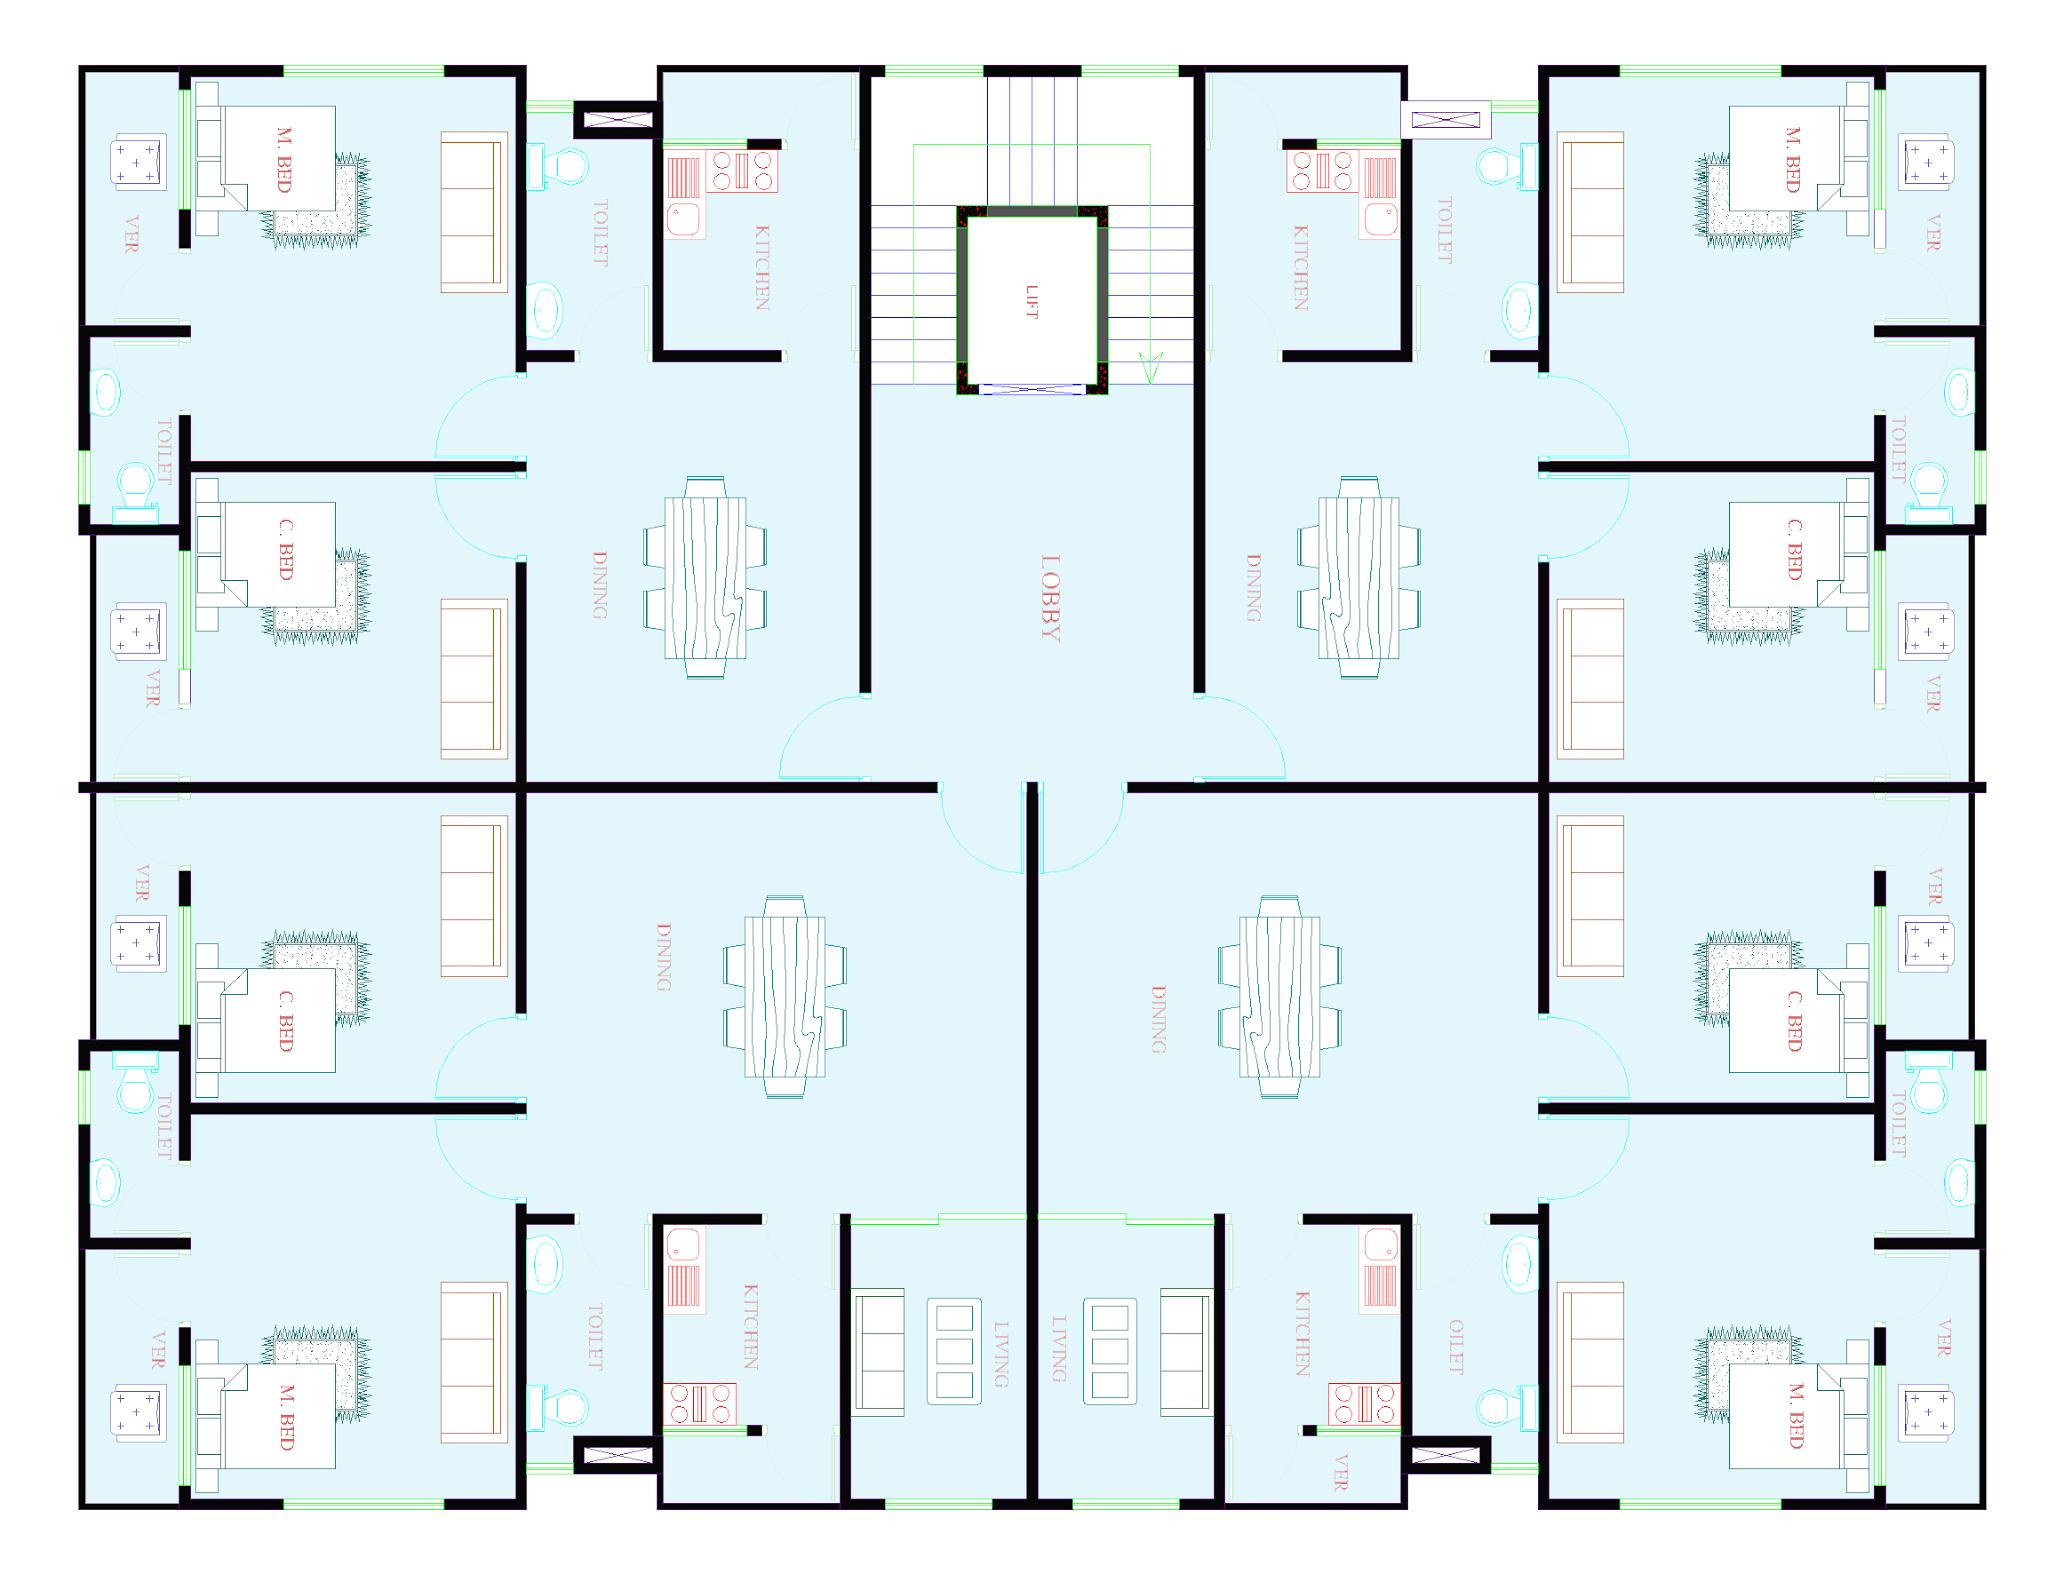 4000 Sq ft first floor plan